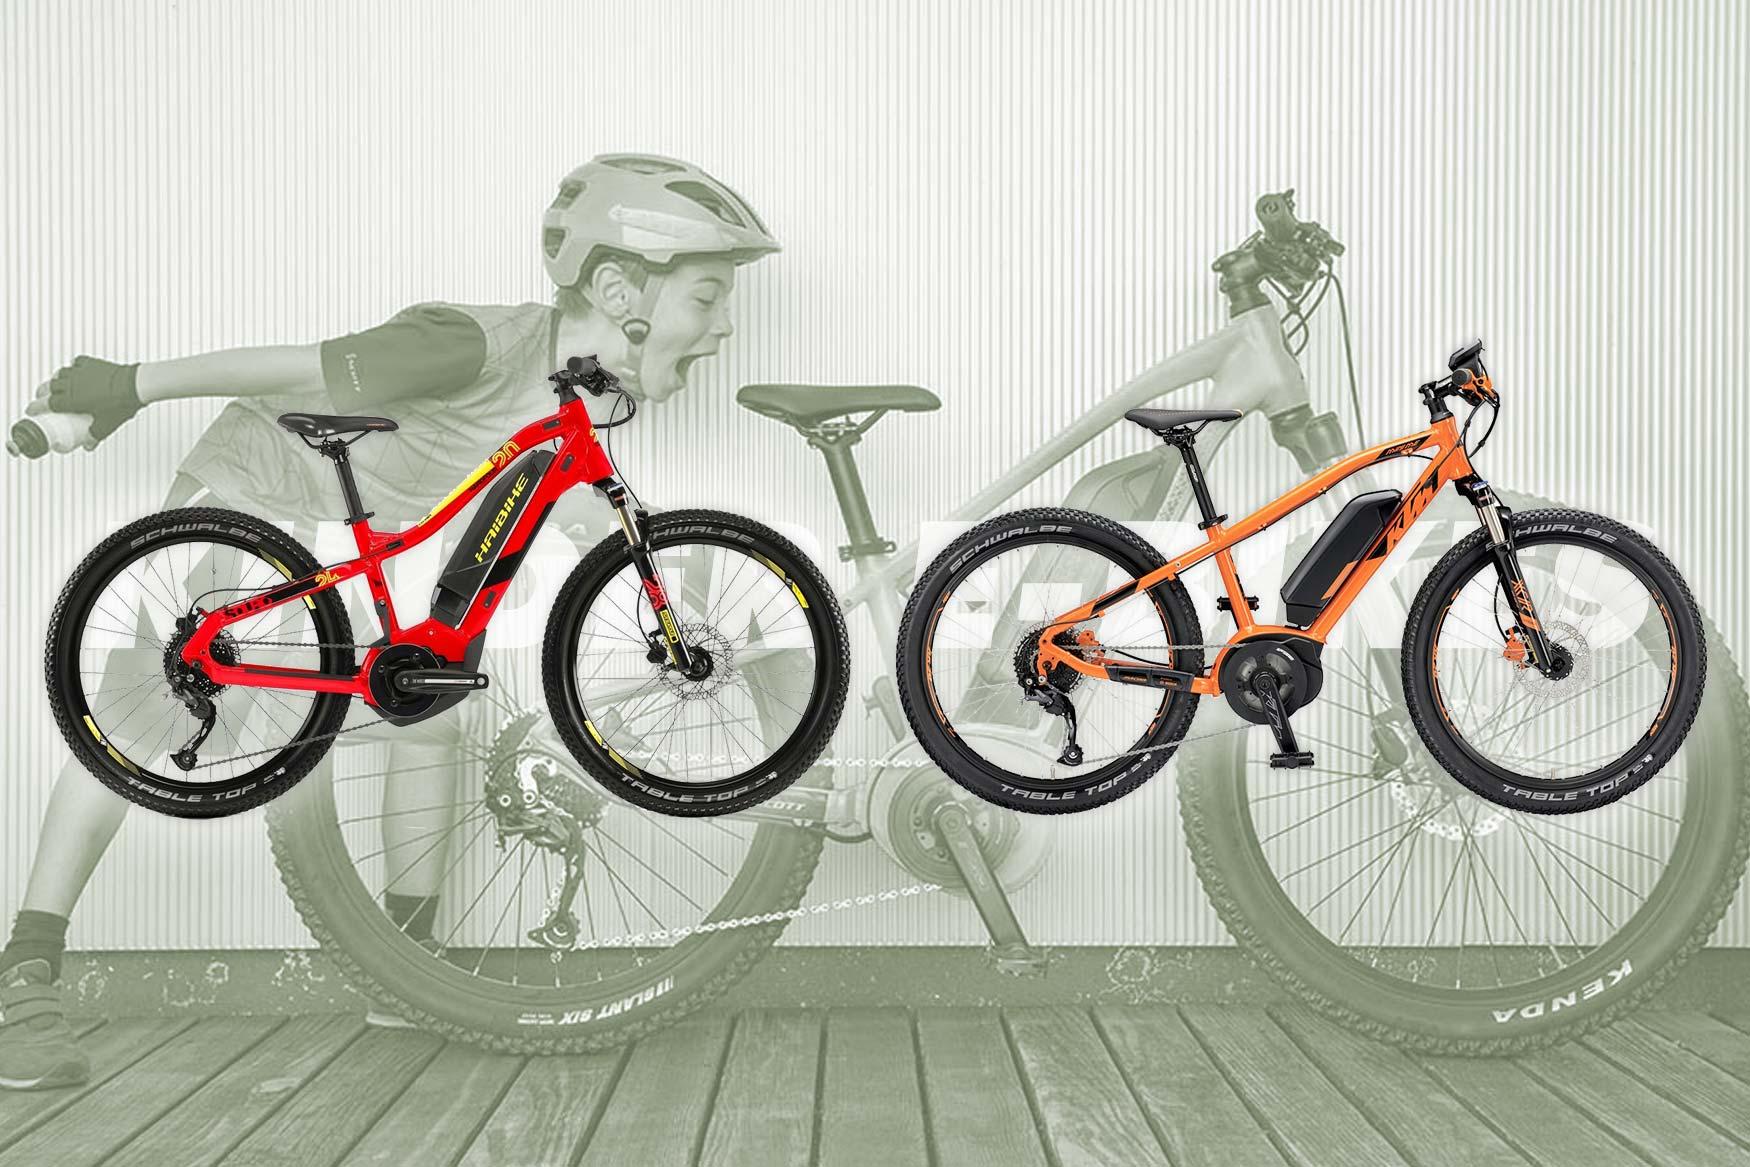 e bikes f r kinder und jugendliche 2019 fahrrad xxl blog. Black Bedroom Furniture Sets. Home Design Ideas